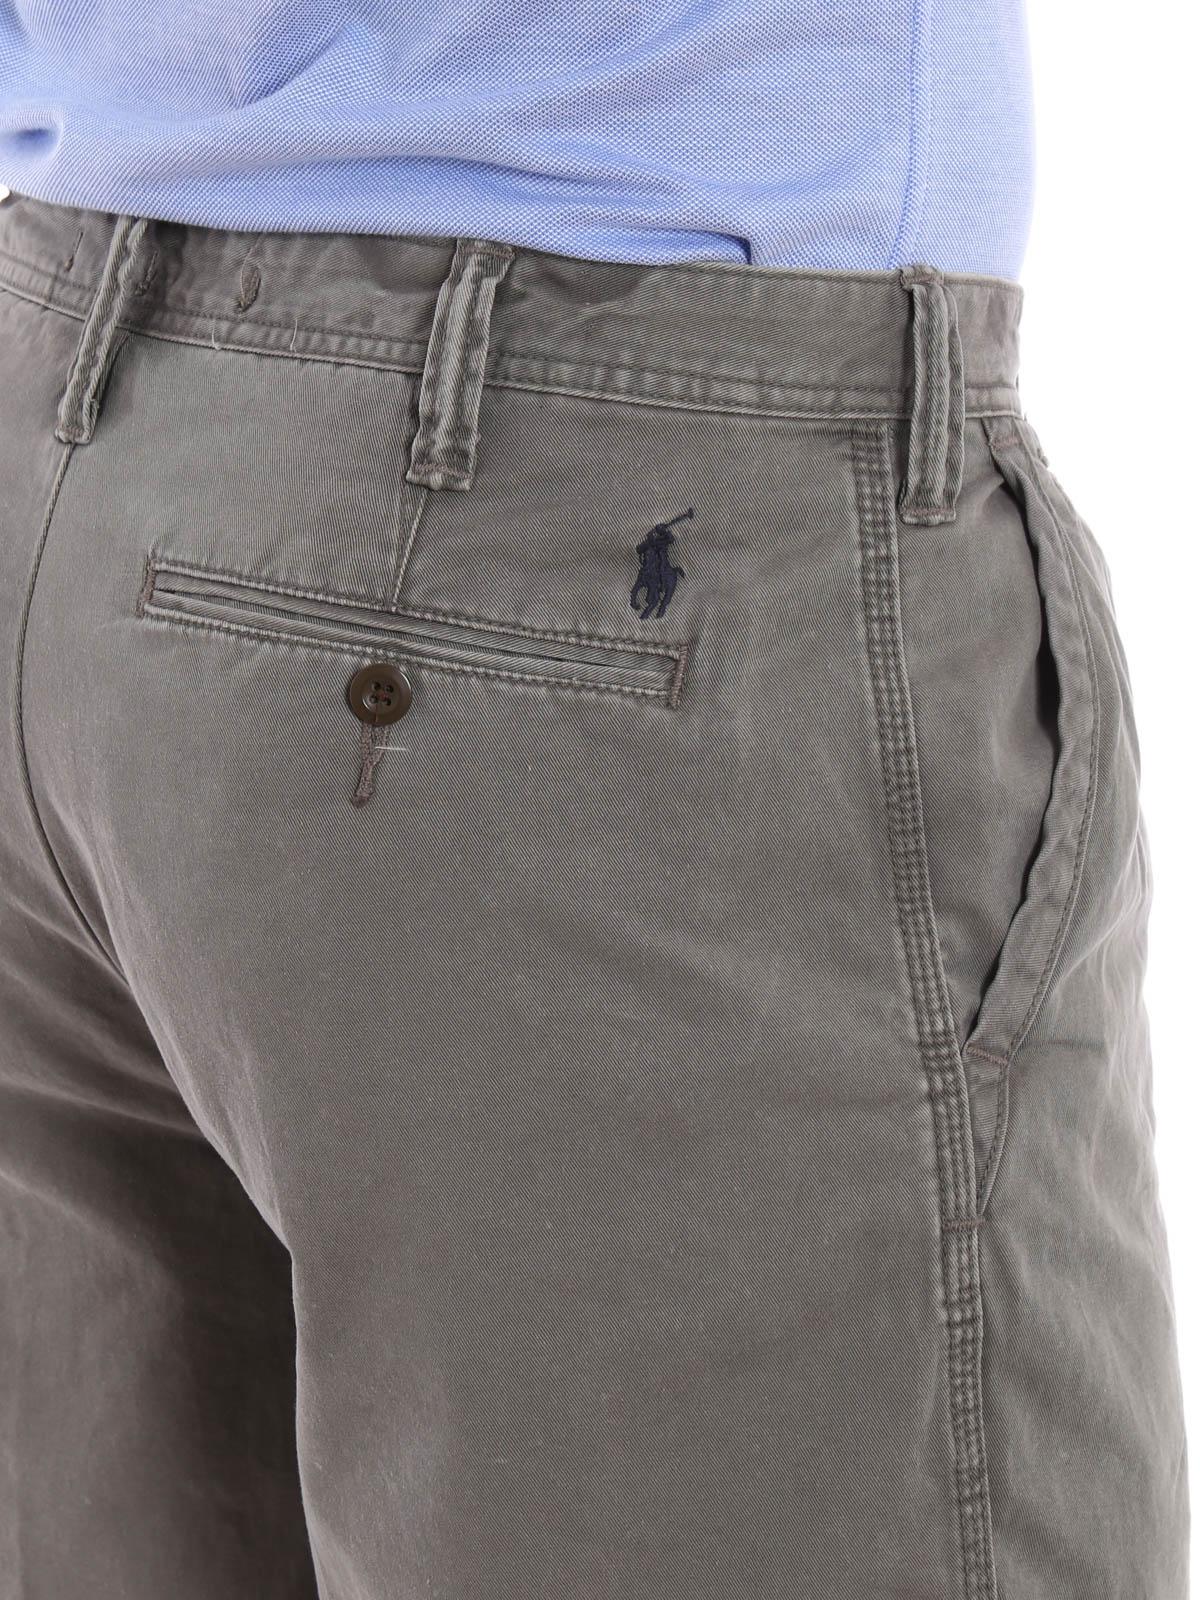 87b2e2171a94e4 Polo Ralph Lauren - Shorts Fur Herren - Grau - Hosen Shorts ...